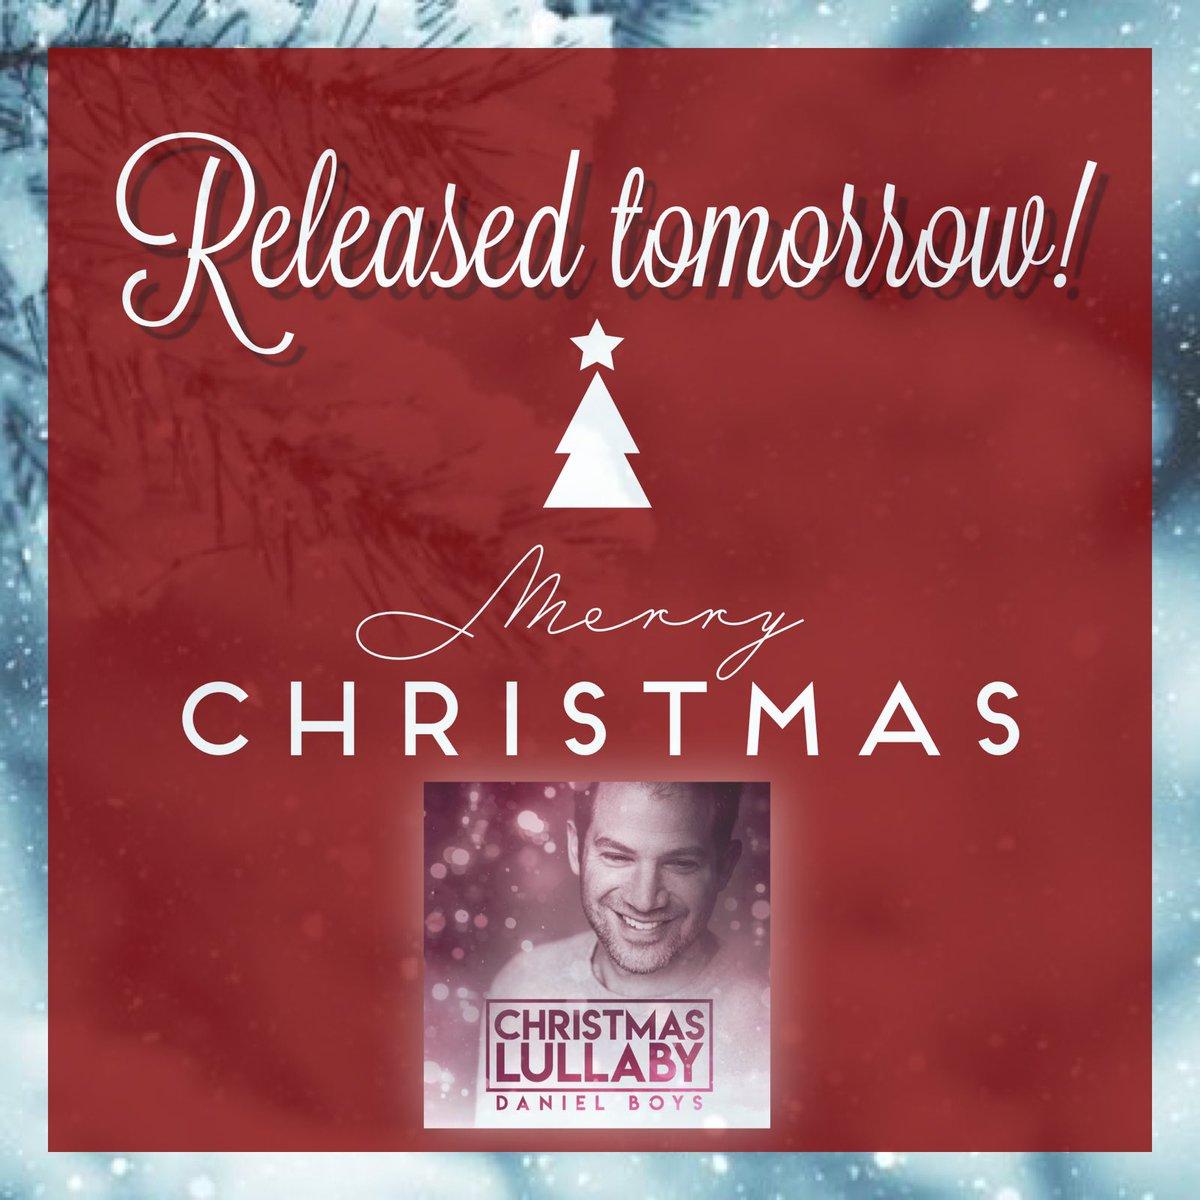 Merry Christmas y'all!! #ChristmasLullaby #NativityRocks